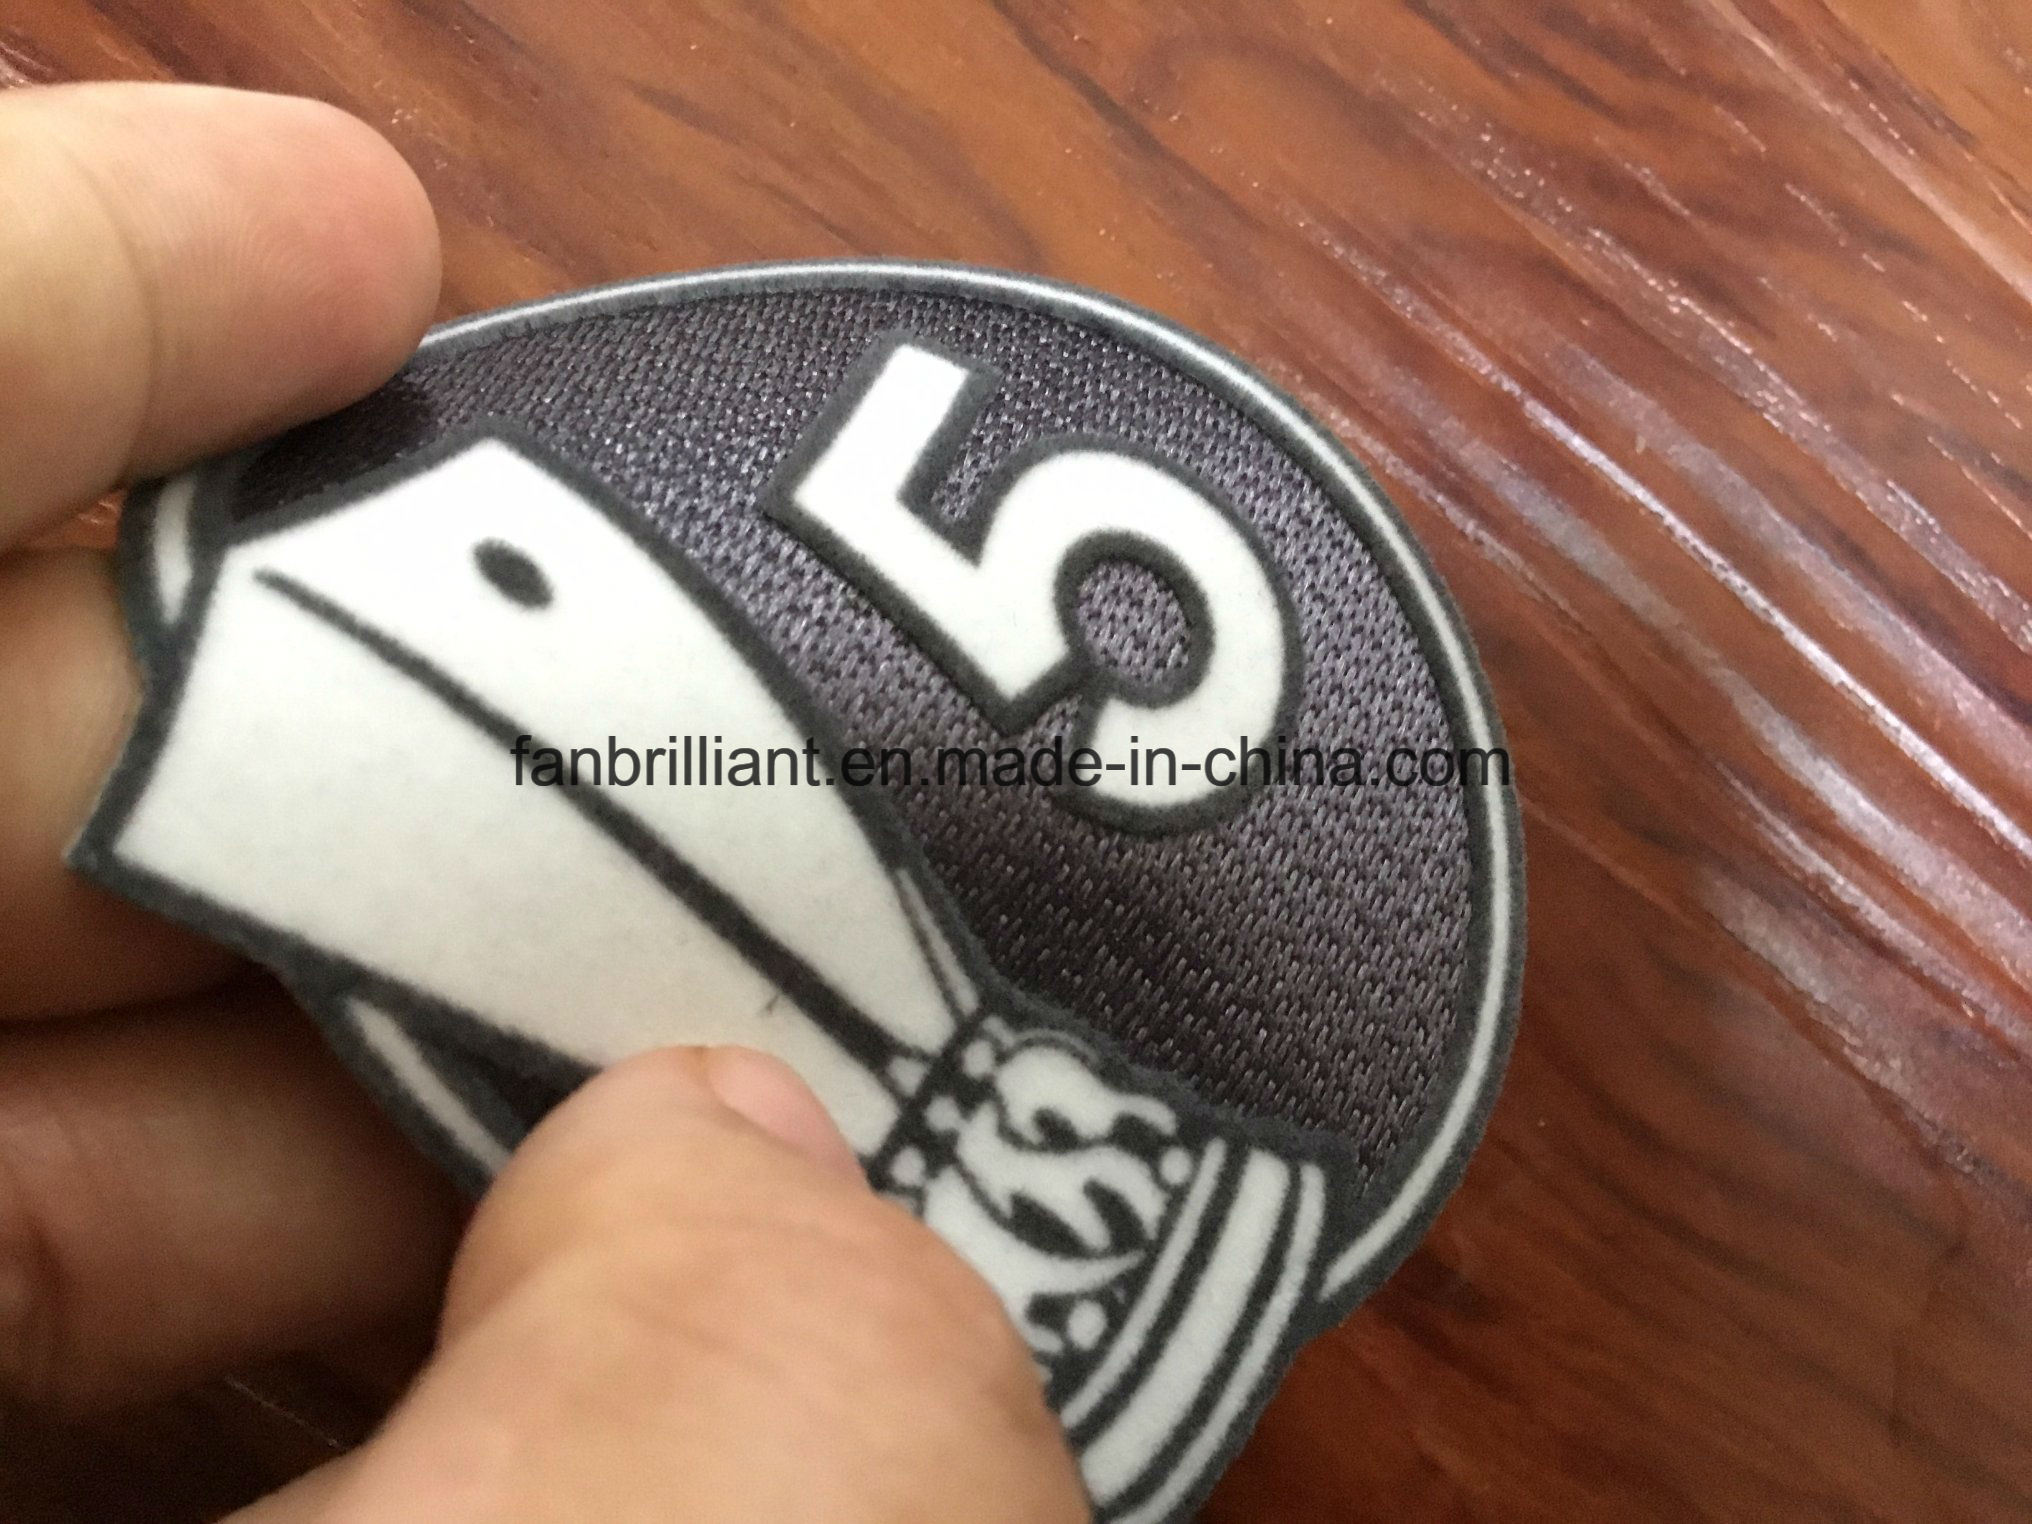 [Hot Item] Soccer/Football/World Cup 3D Flock Transfer Badges Soccer Patch